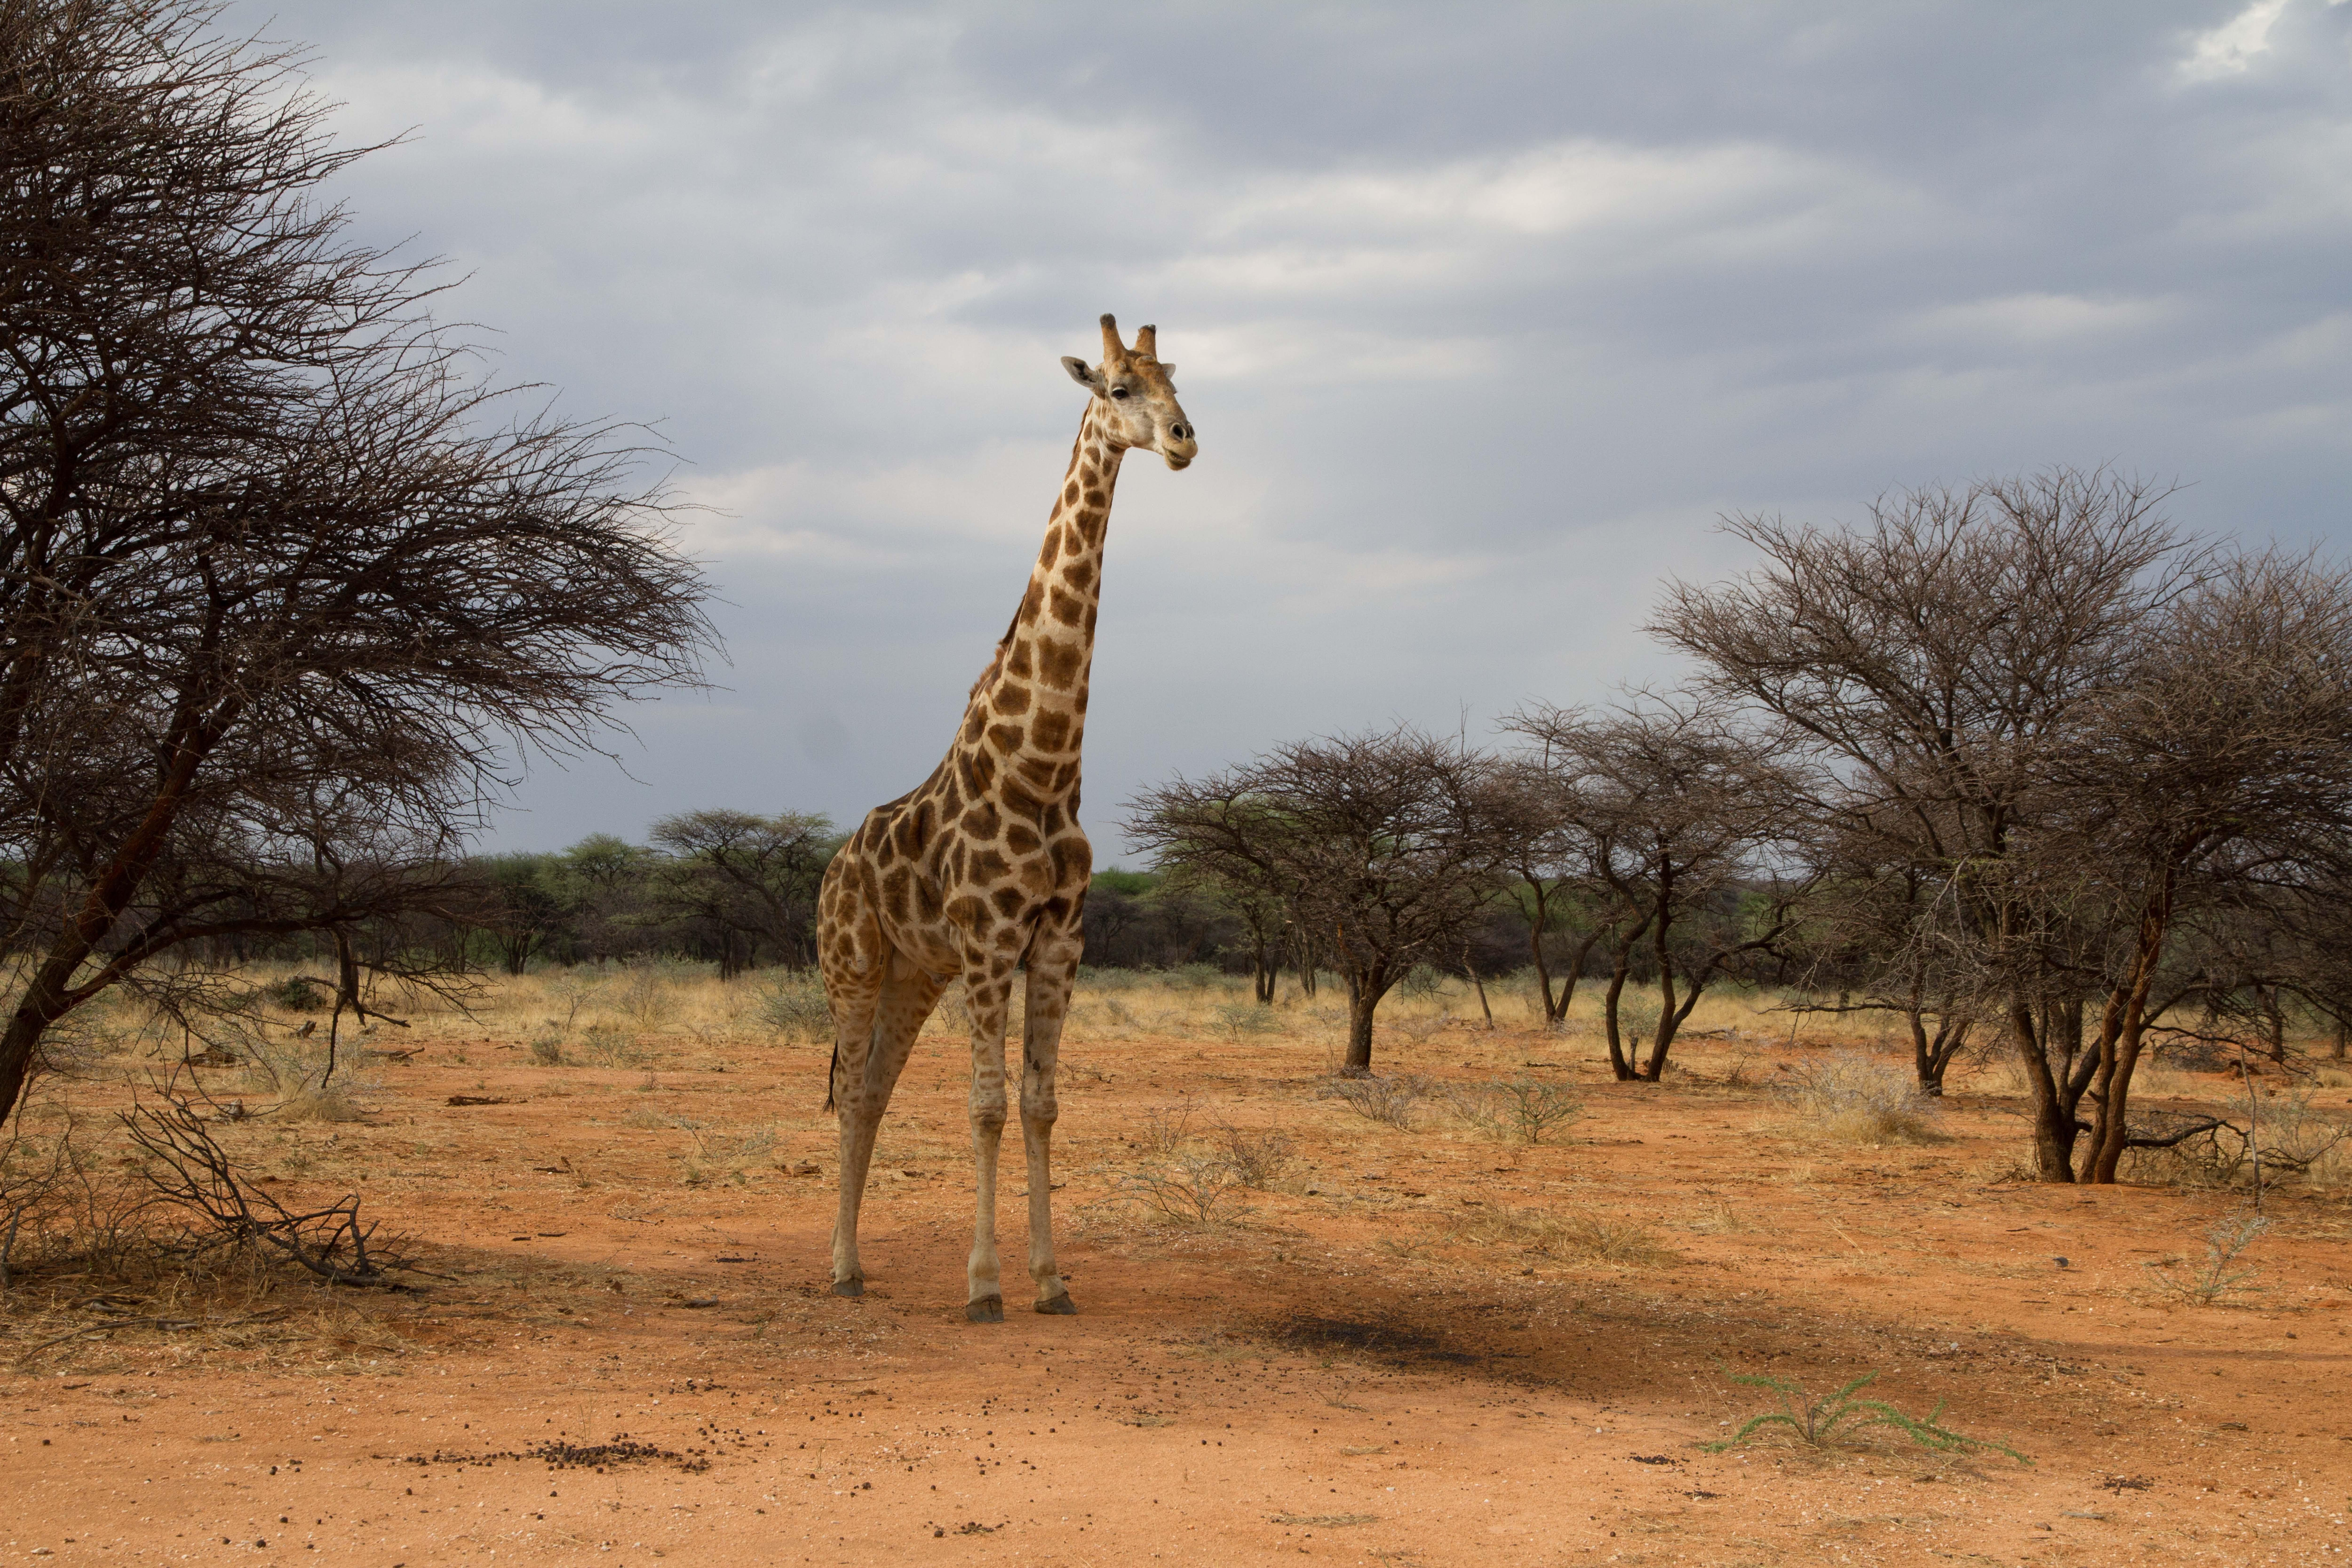 Deze giraf kwam erg dichtbij